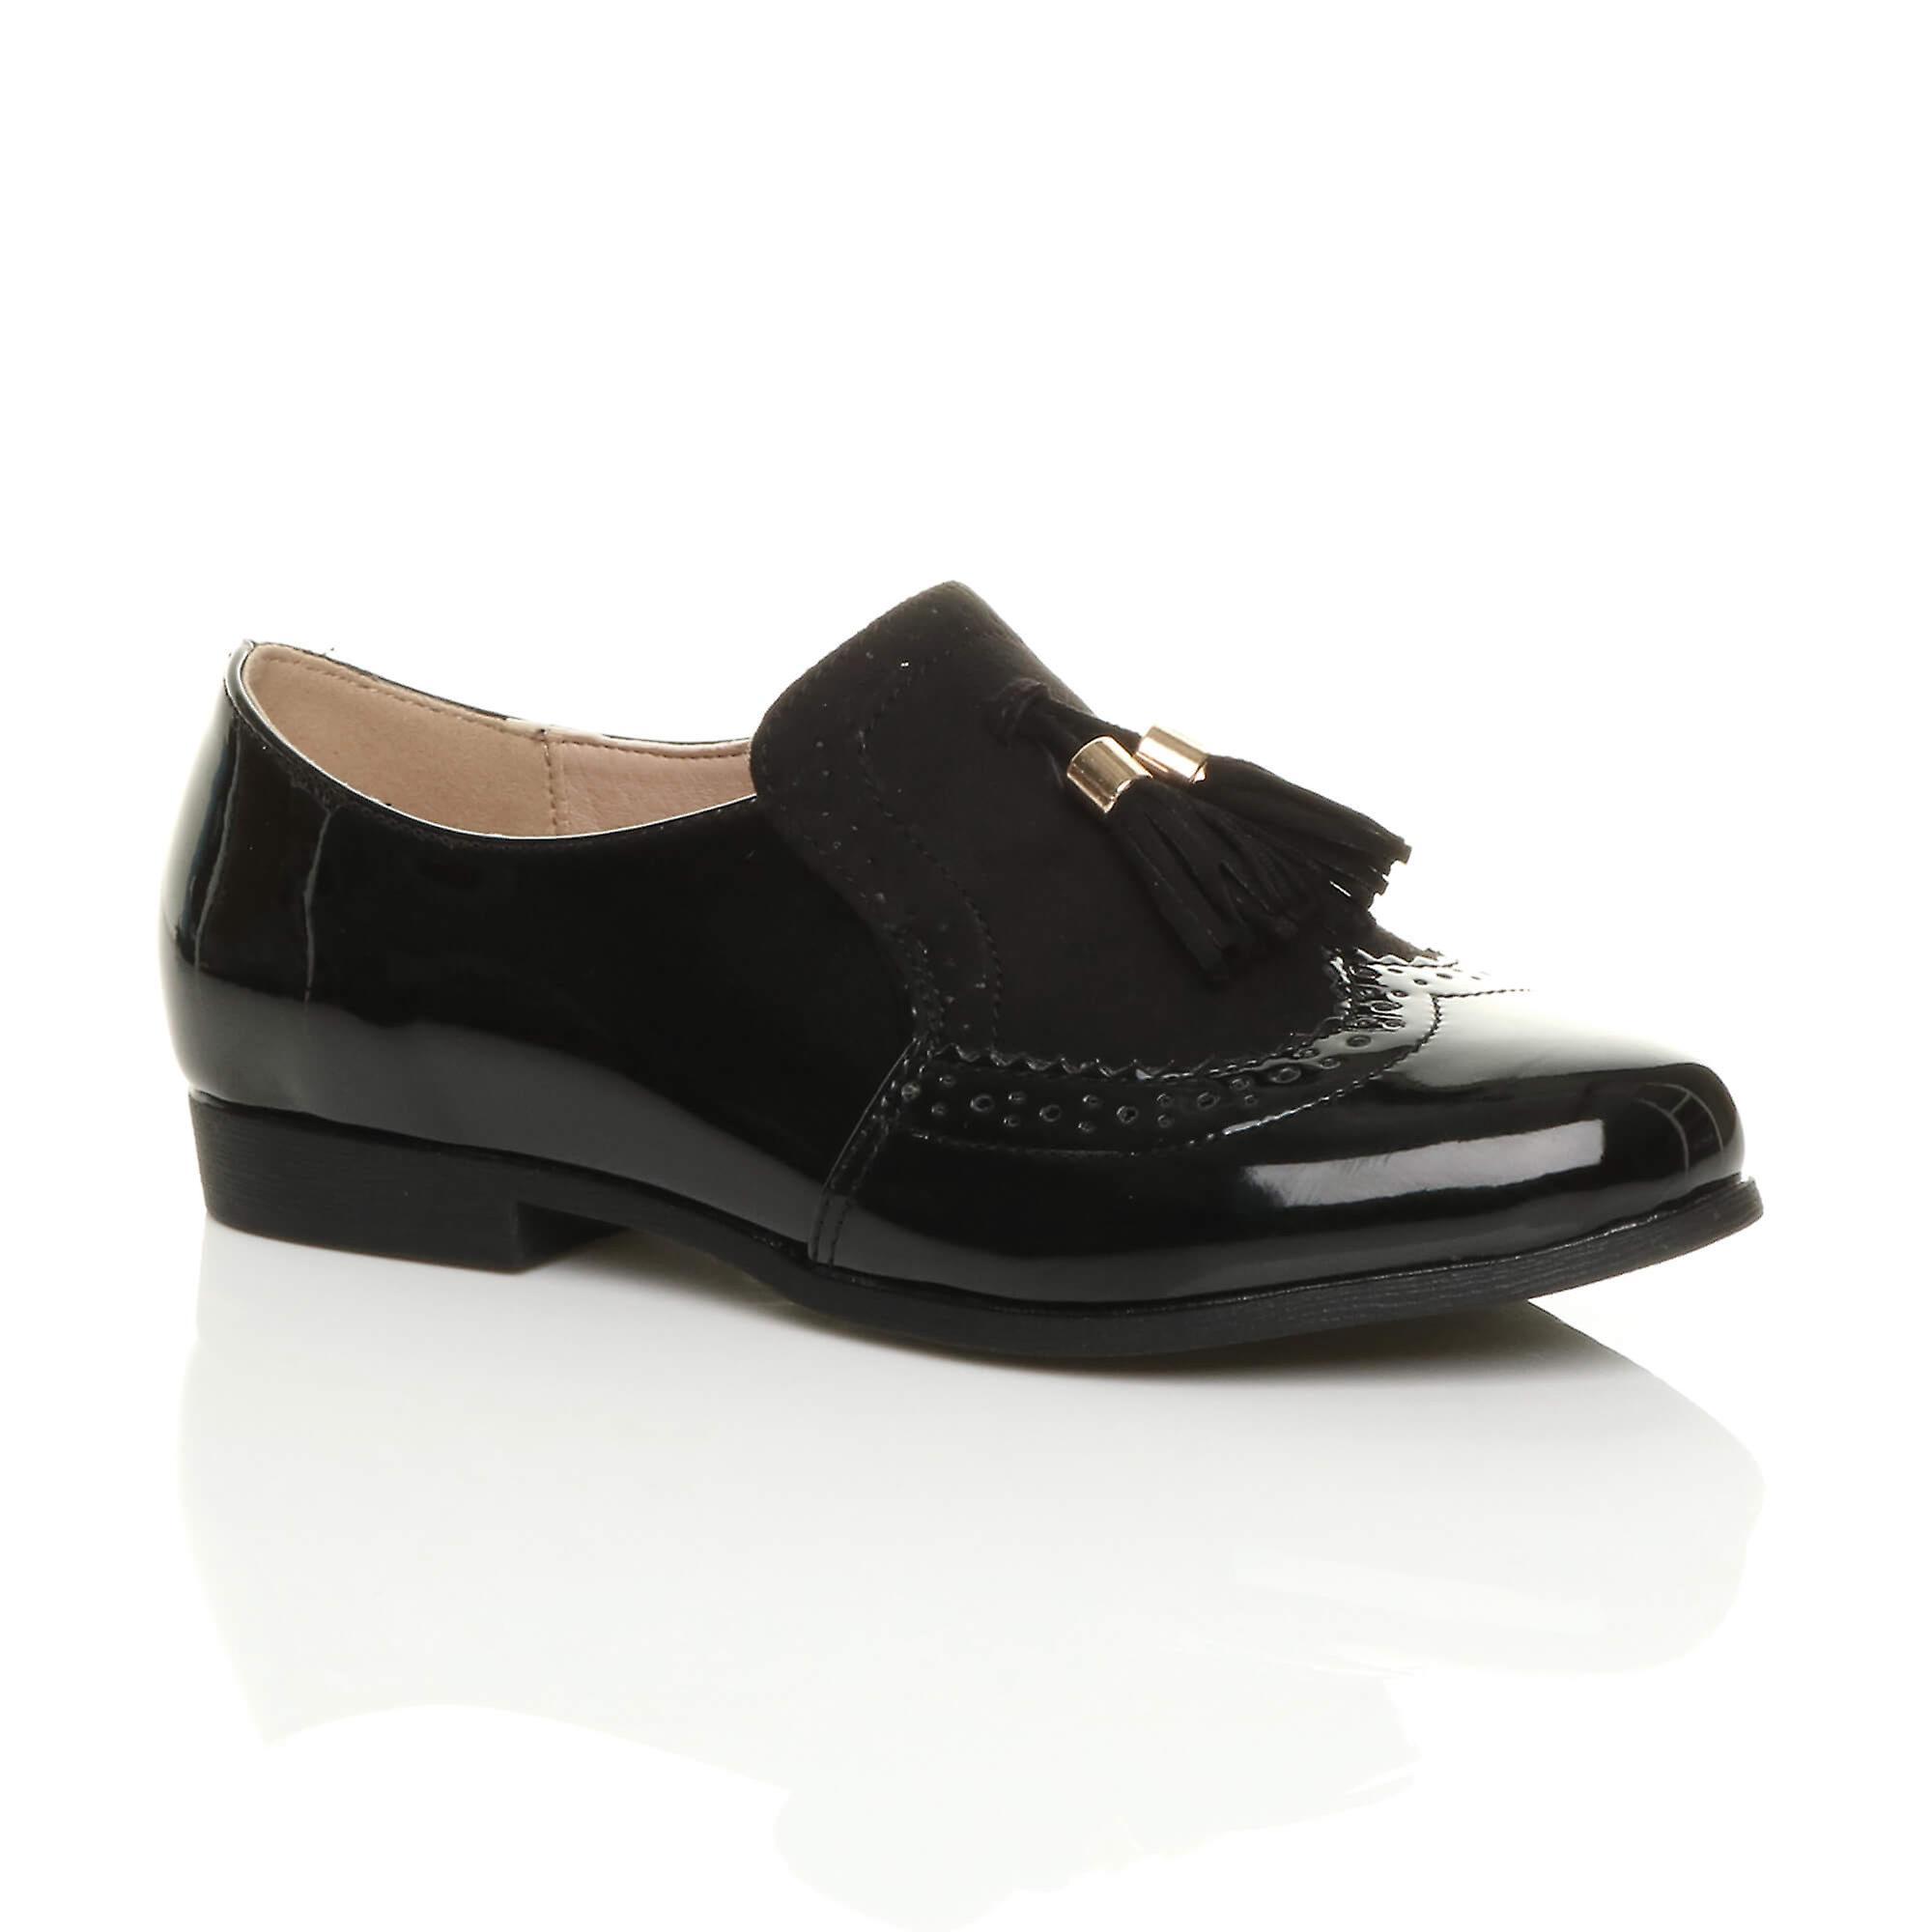 Ajvani womens low heel flat tassel vintage style smart work shoes brogues 9Q1c2